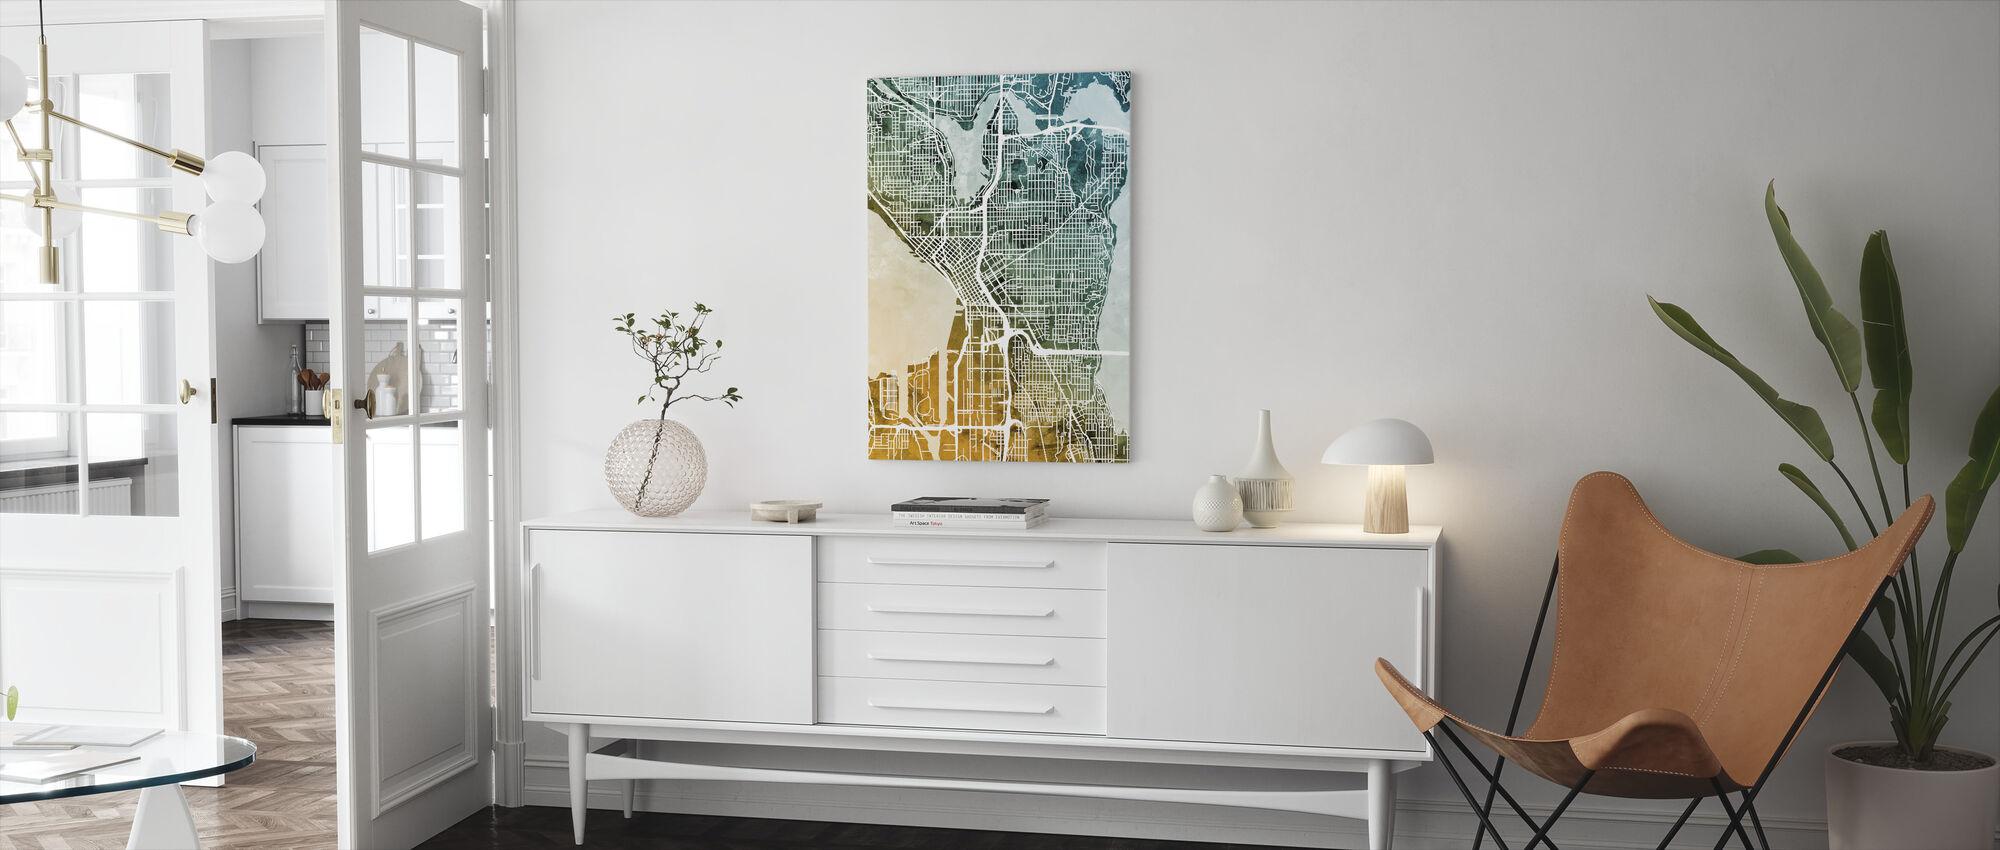 Seattle Washington Street Map - Canvas print - Living Room